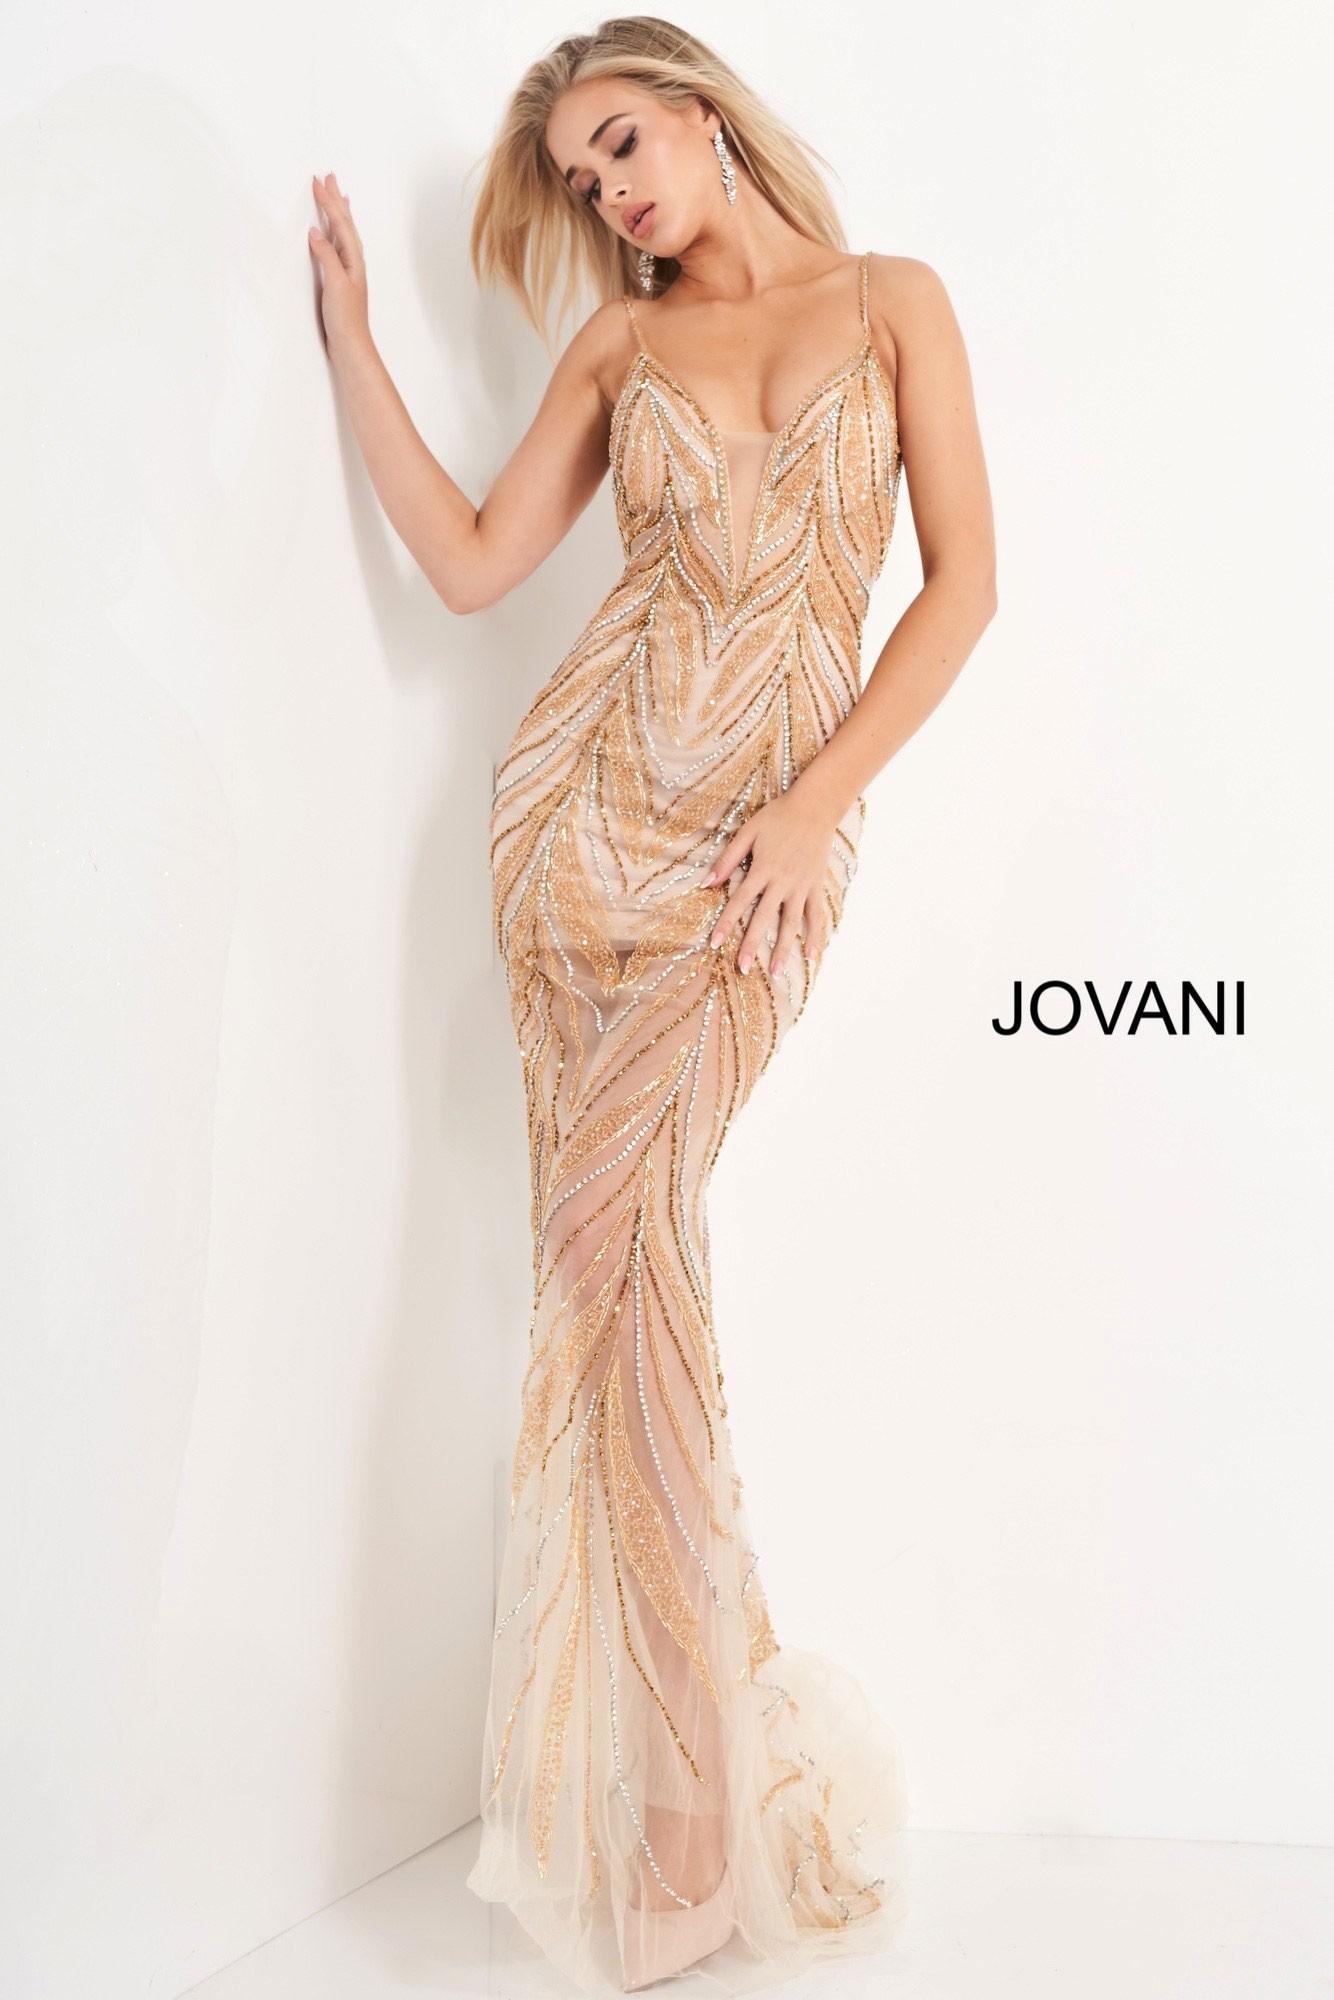 Jovani 00613 Plunge Neck Beaded Mesh Prom Dress